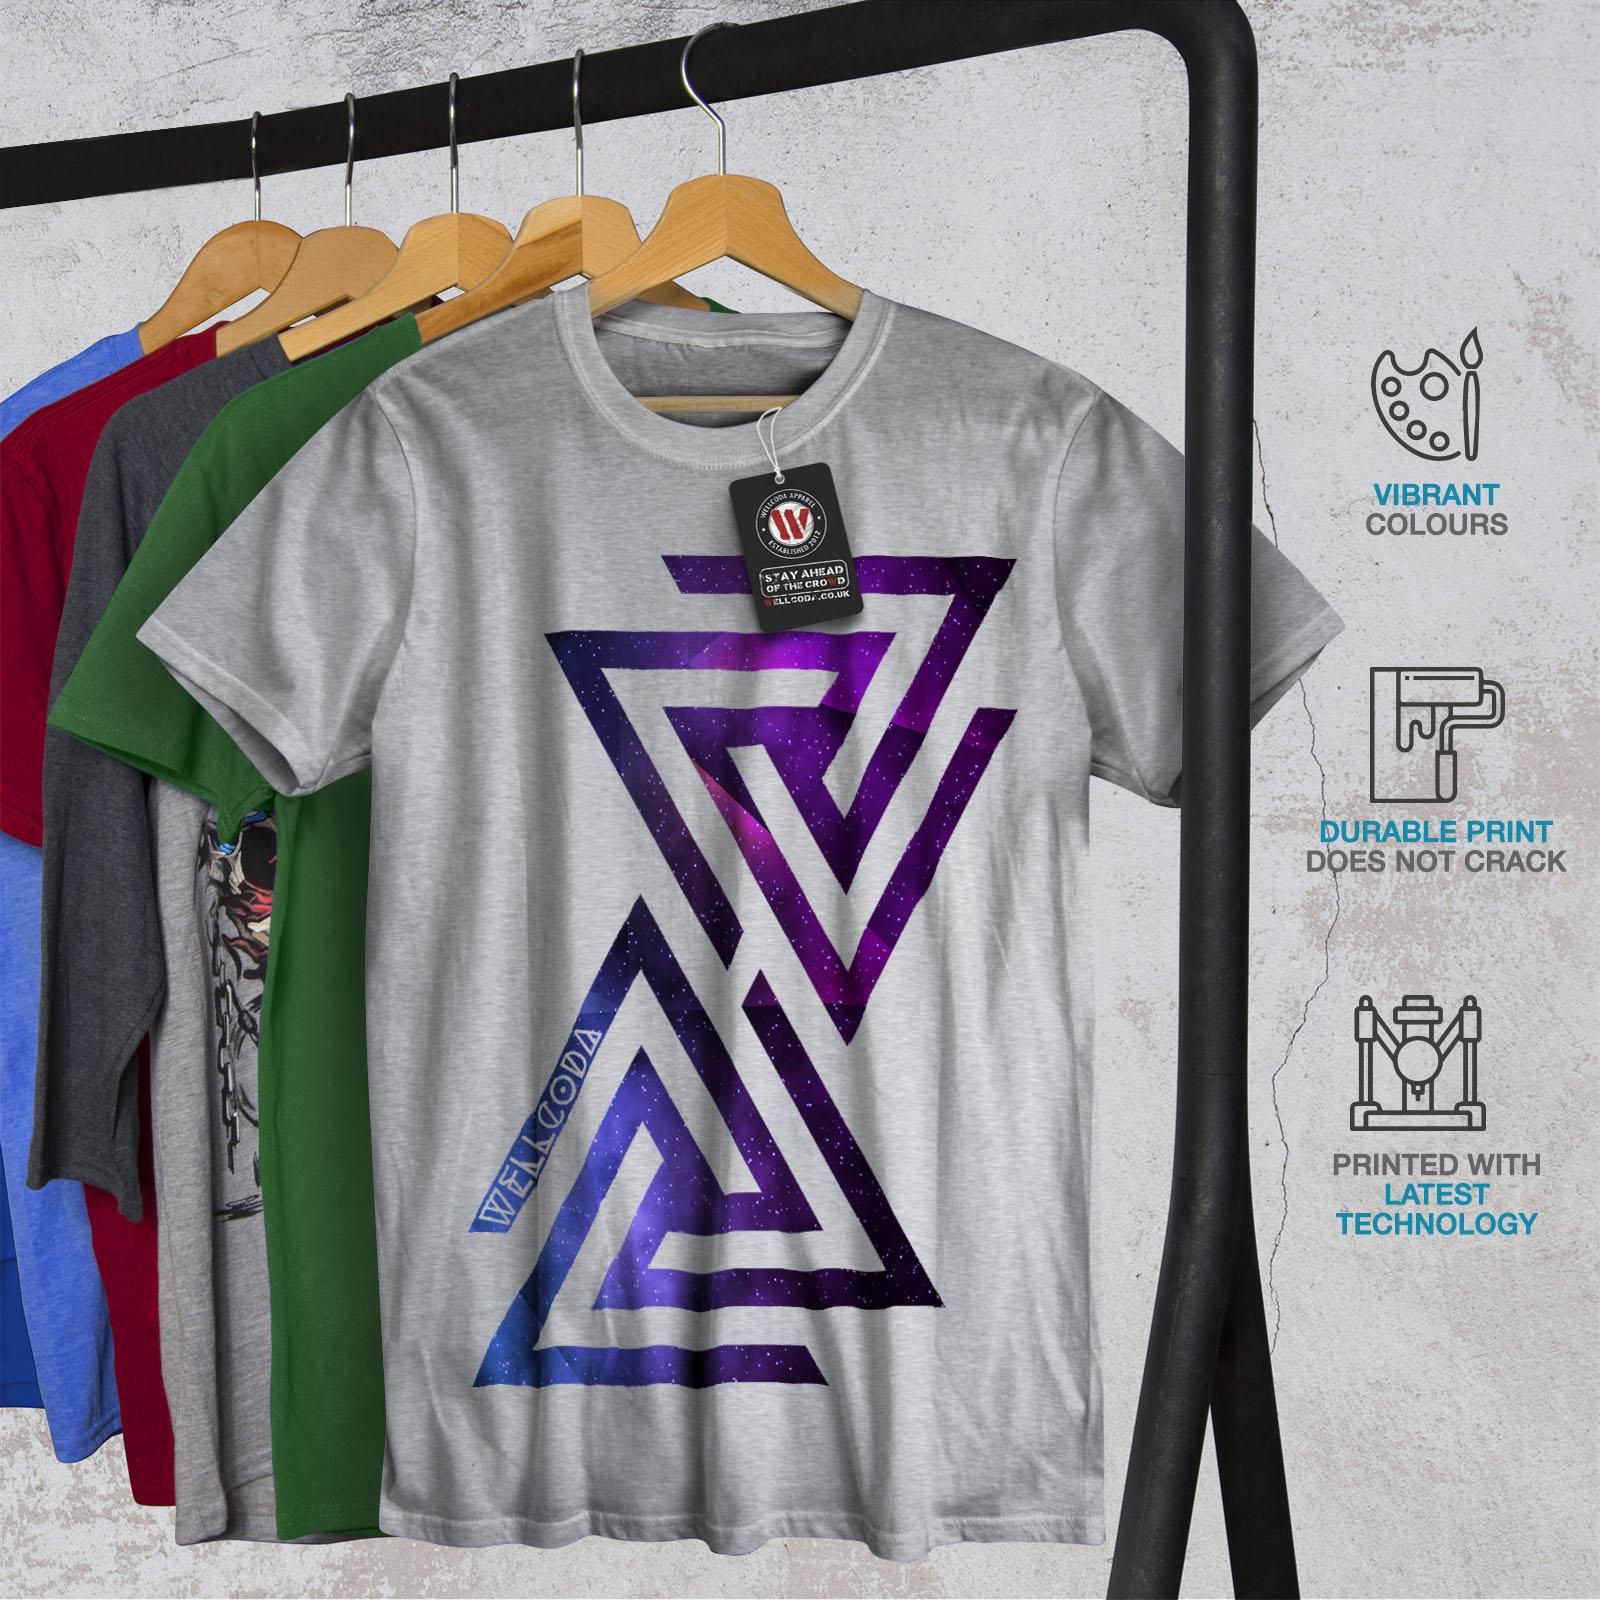 Galaxy Graphic Design Printed Tee Wellcoda Triangle Universe Mens T-shirt